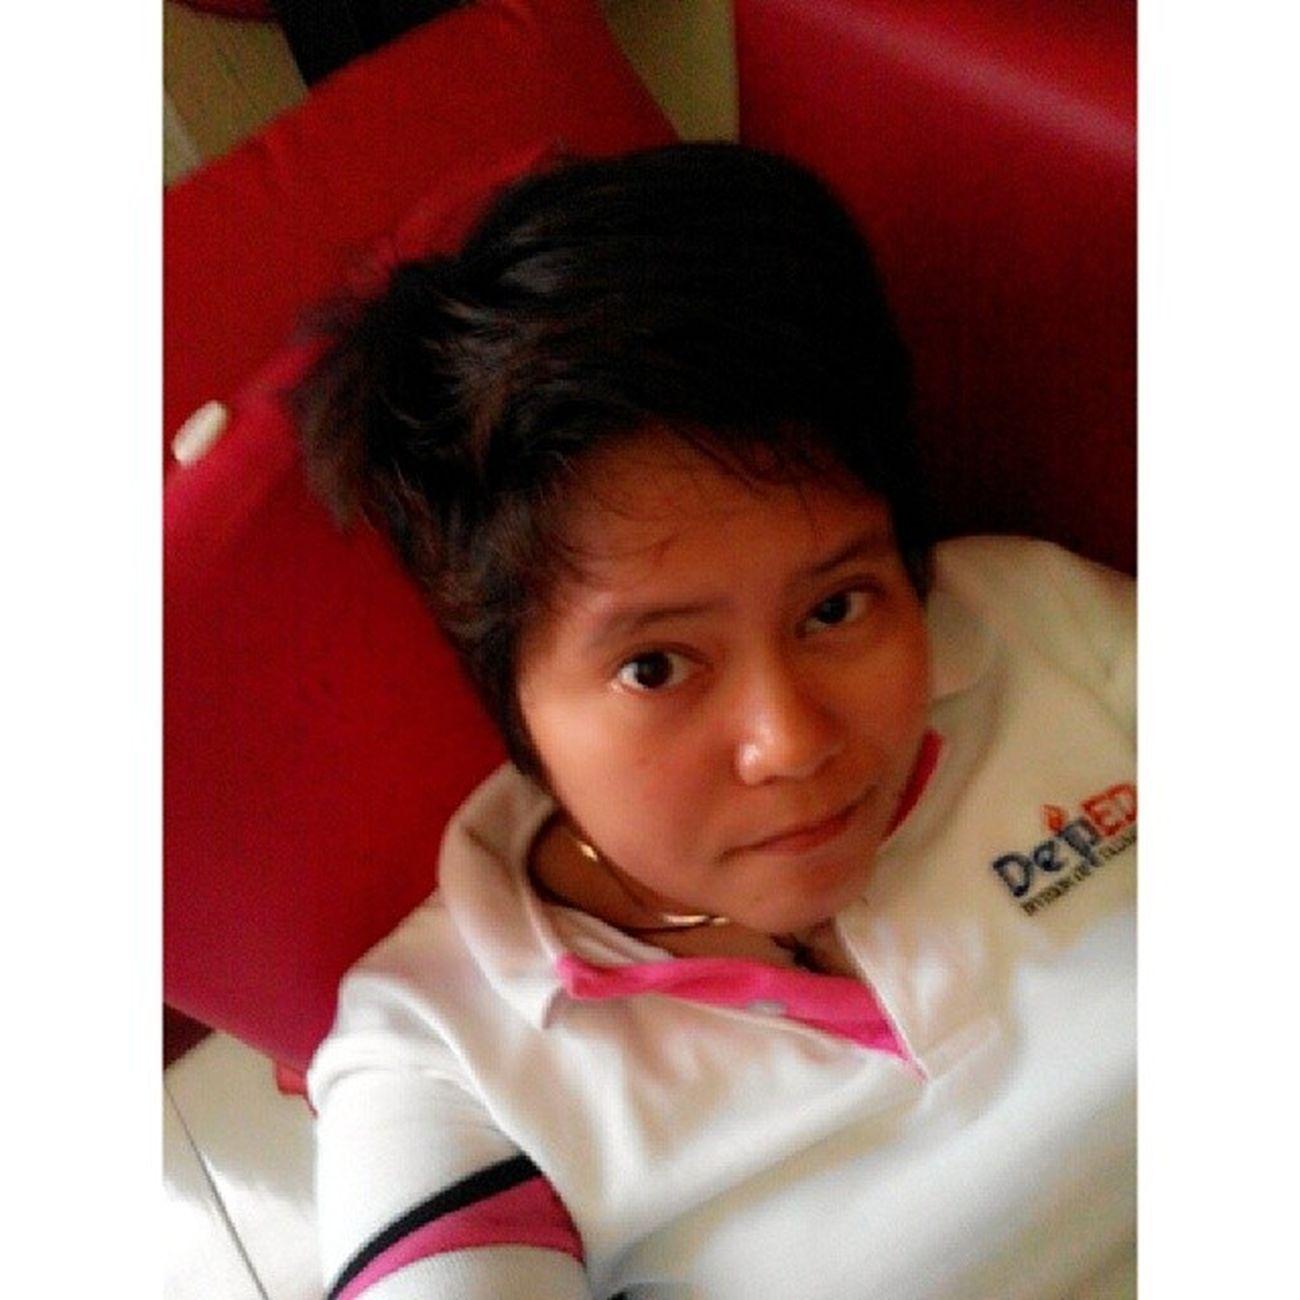 [°_°] Selfie DepEd Educator Teacher shameless shorthair haggard love life igers Cebu Pinoy igdaily potd fotodroids LitratongPinoy instagramhubfollow follow lgbt_pinoy lgbt equality noh8 lesbian androgynous lesbiansofinstagram lezziegram queer LFoi lesbianhour